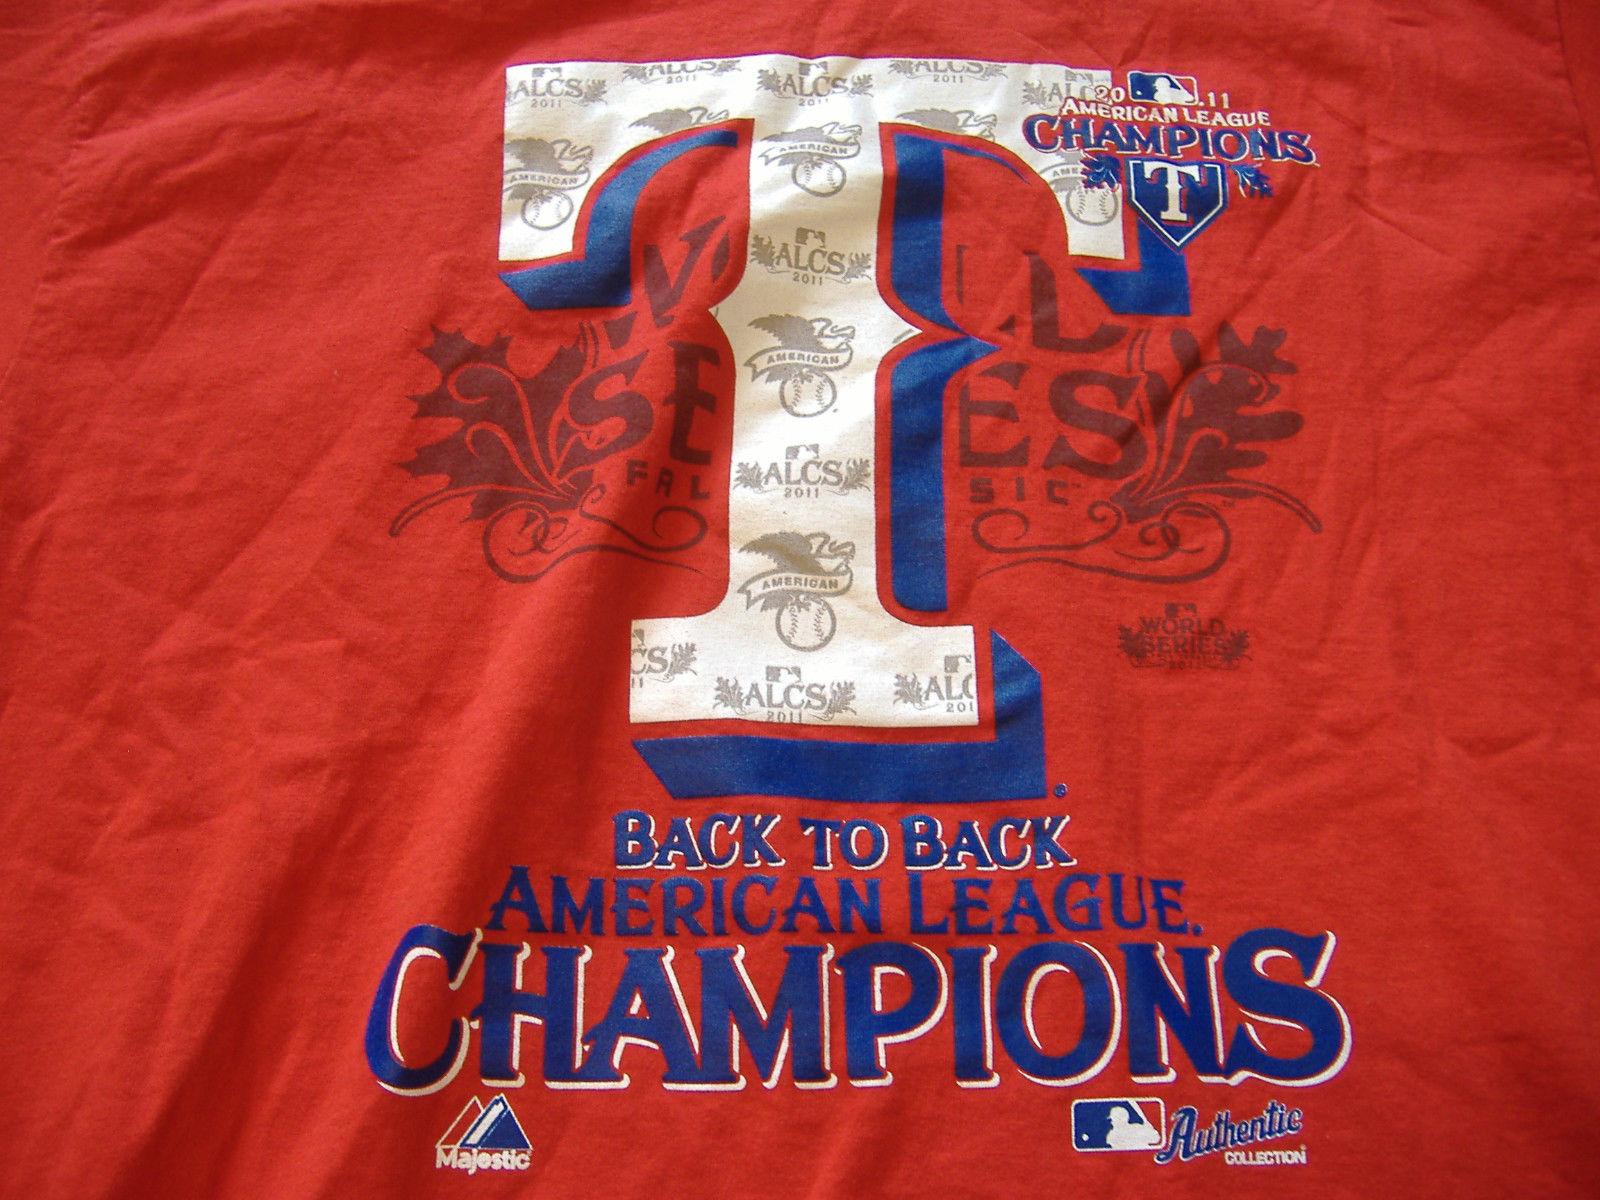 MLB Texas Rangers Baseball 2011 American League Champions Red Graphic Shirt - L - $17.17